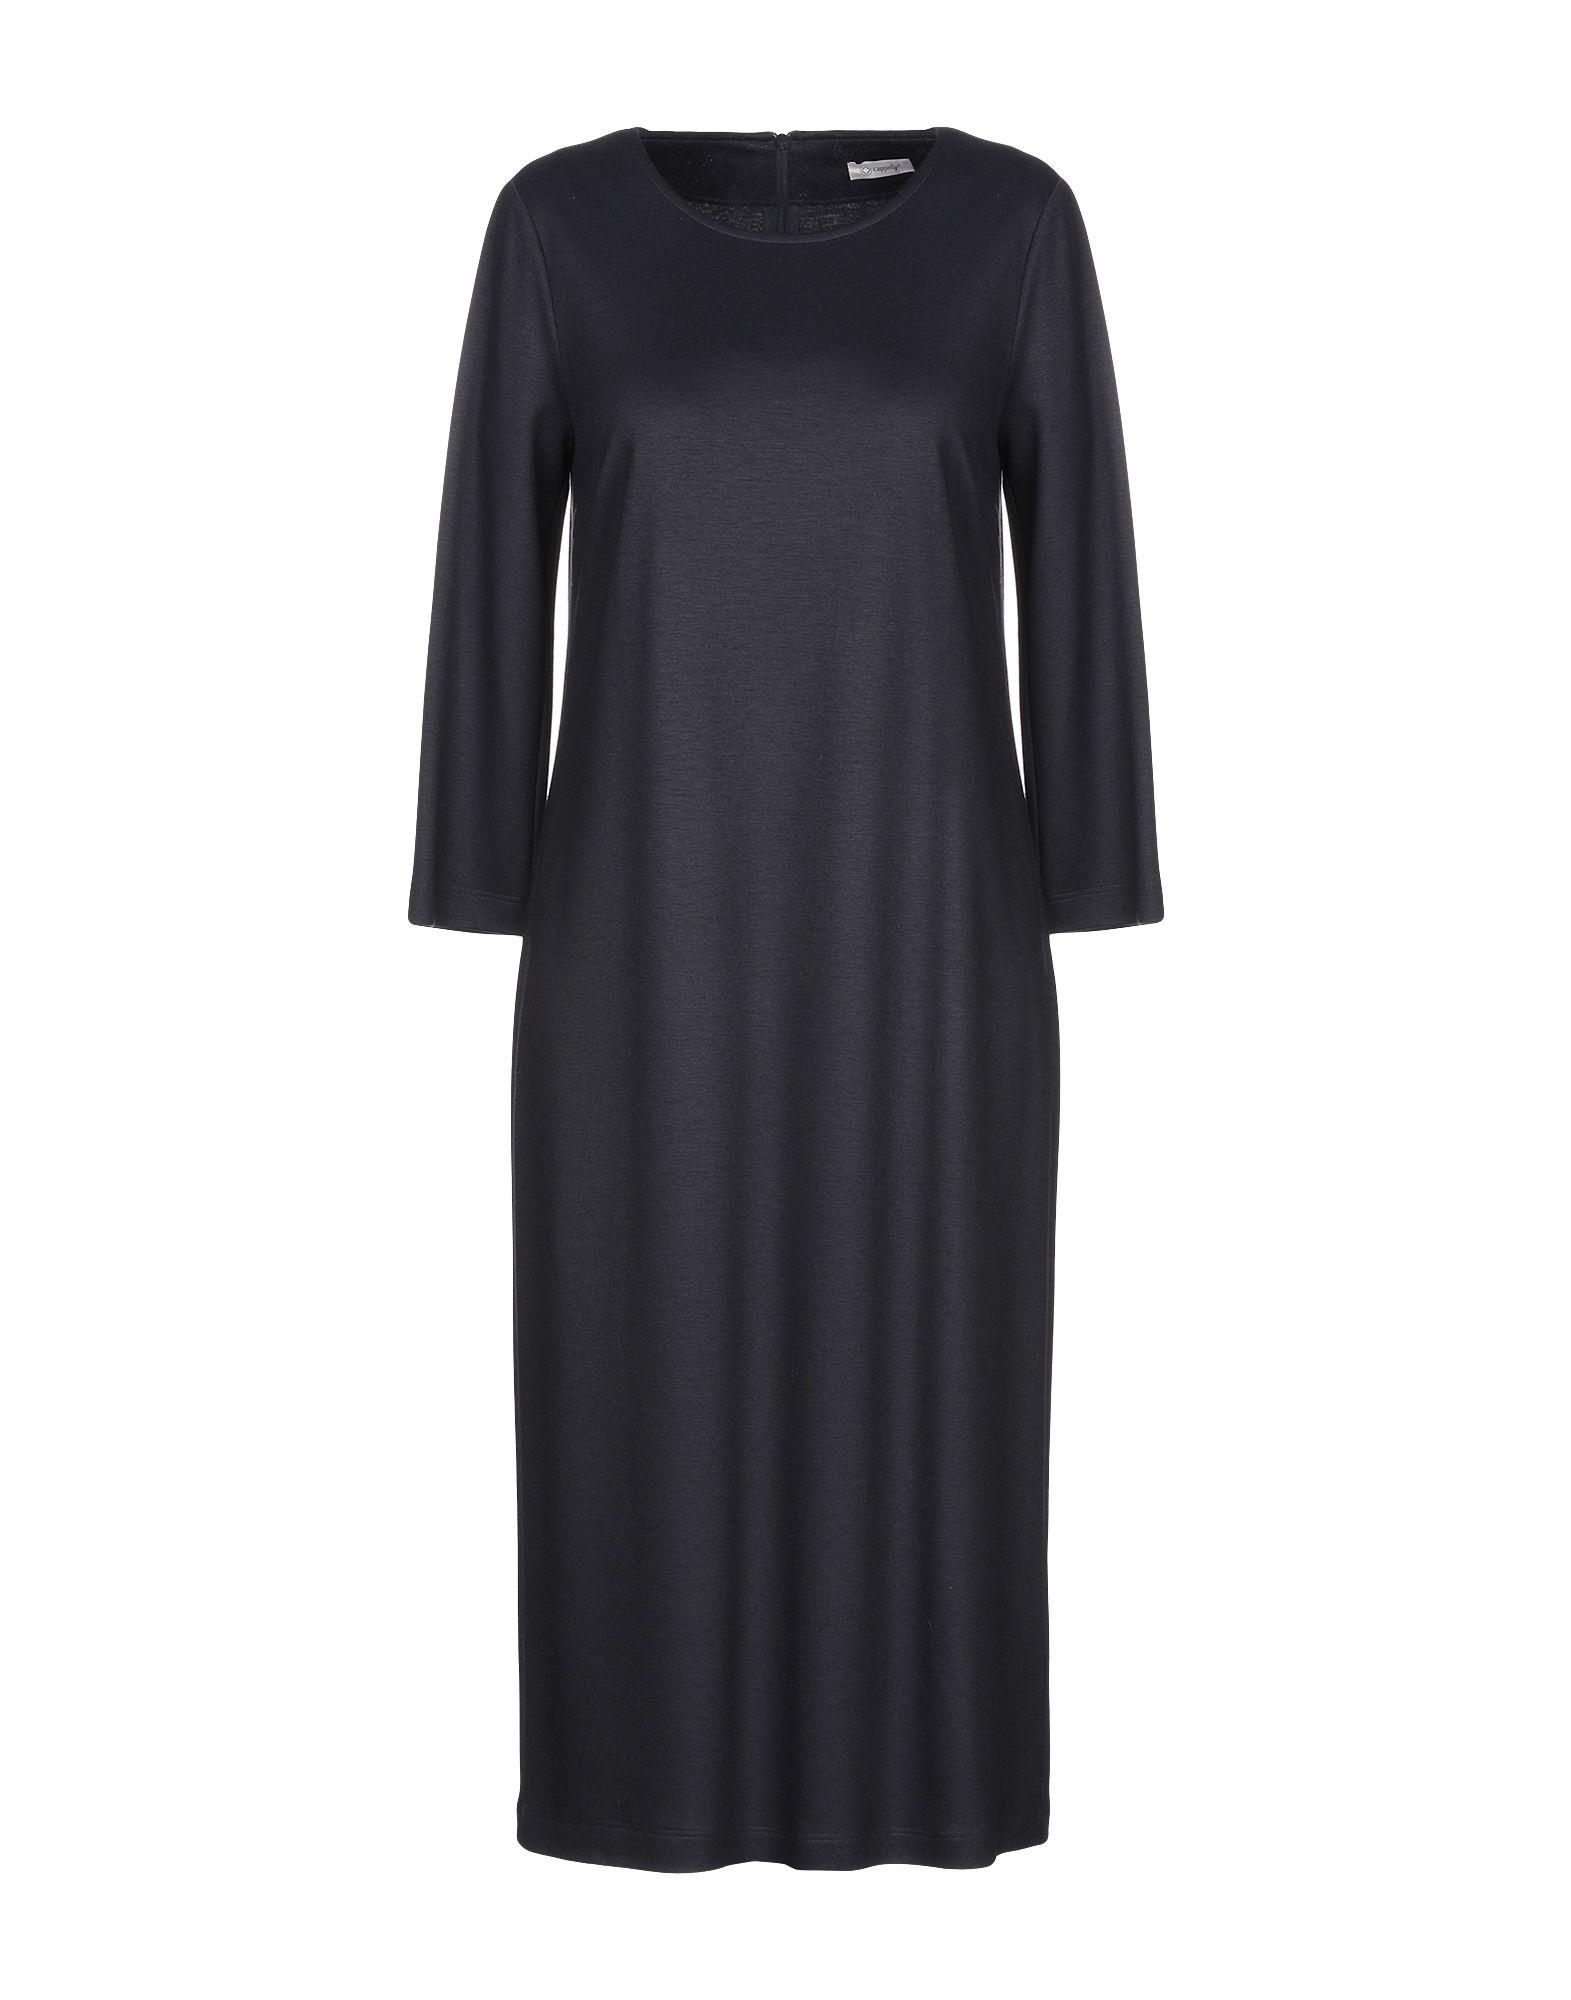 CAPPELLINI by PESERICO Платье длиной 3/4 цена 2017